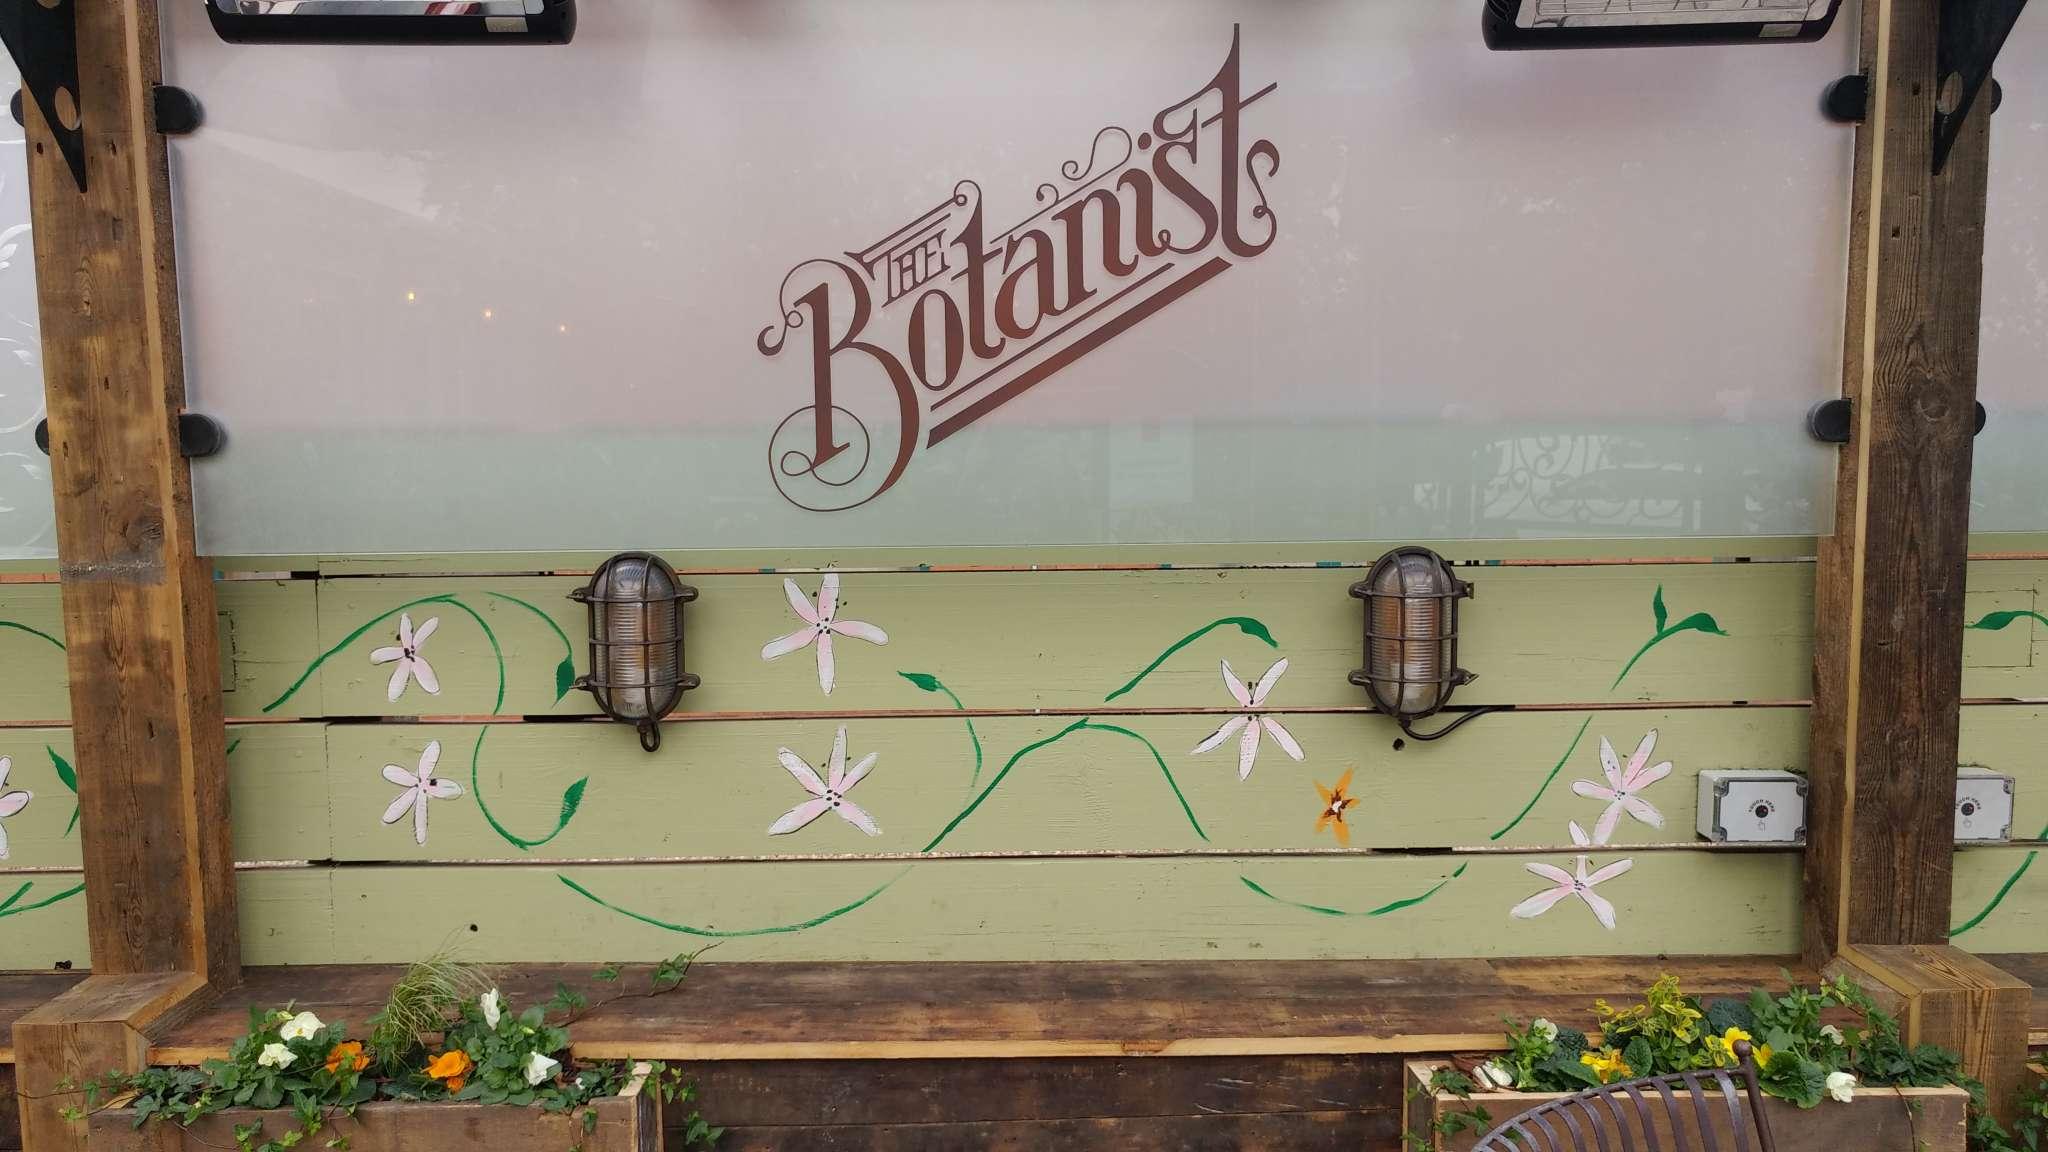 BUSINESS BLOOMS FOR THE BOTANIST IN WEST BRIDGFORD, NOTTINGHAM